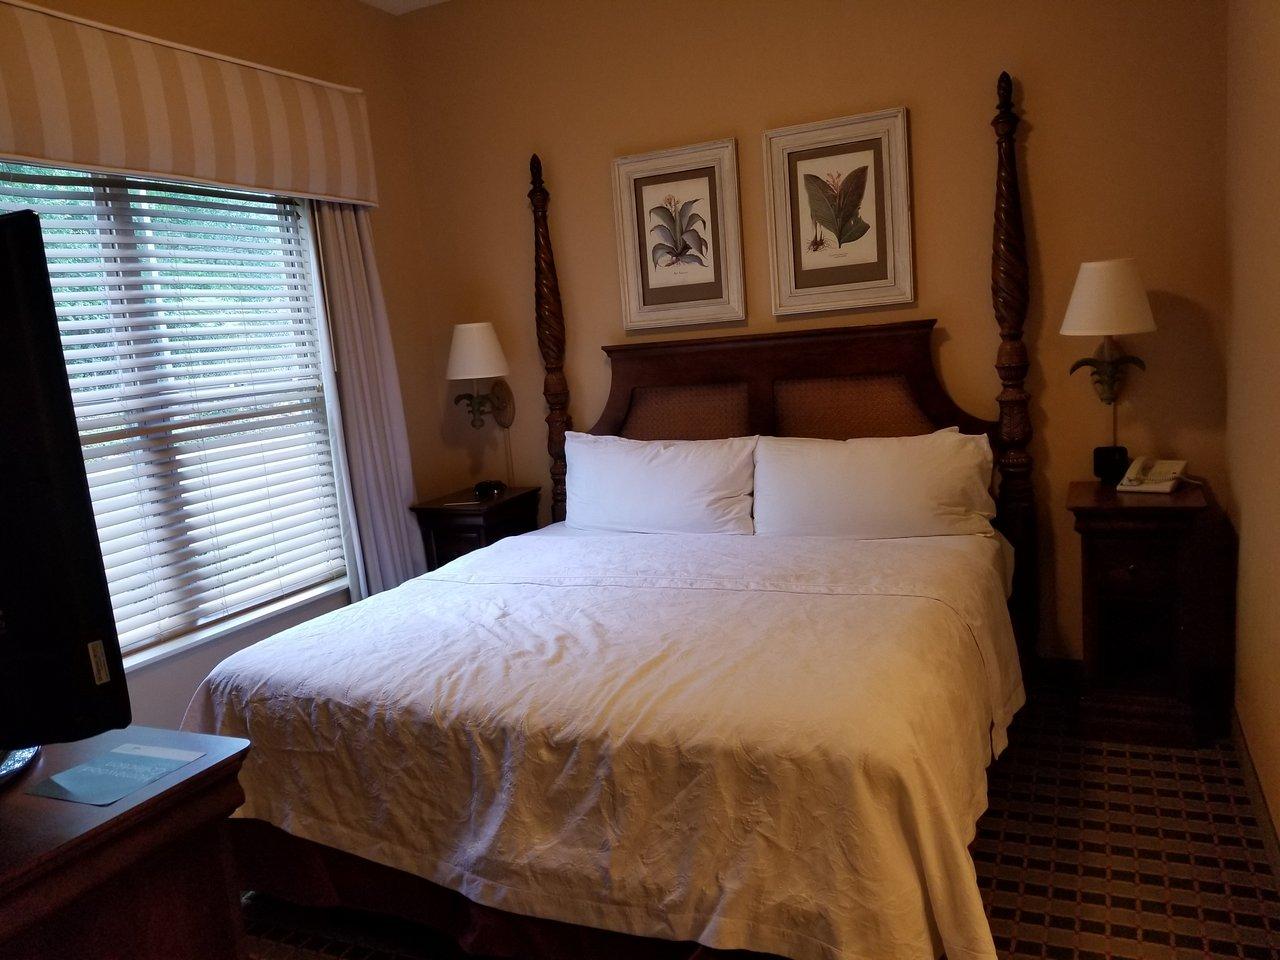 HOMEWOOD SUITES PENSACOLA-ARPT (CORDOVA MALL AREA) $124 ($̶1̶4̶4̶ ...